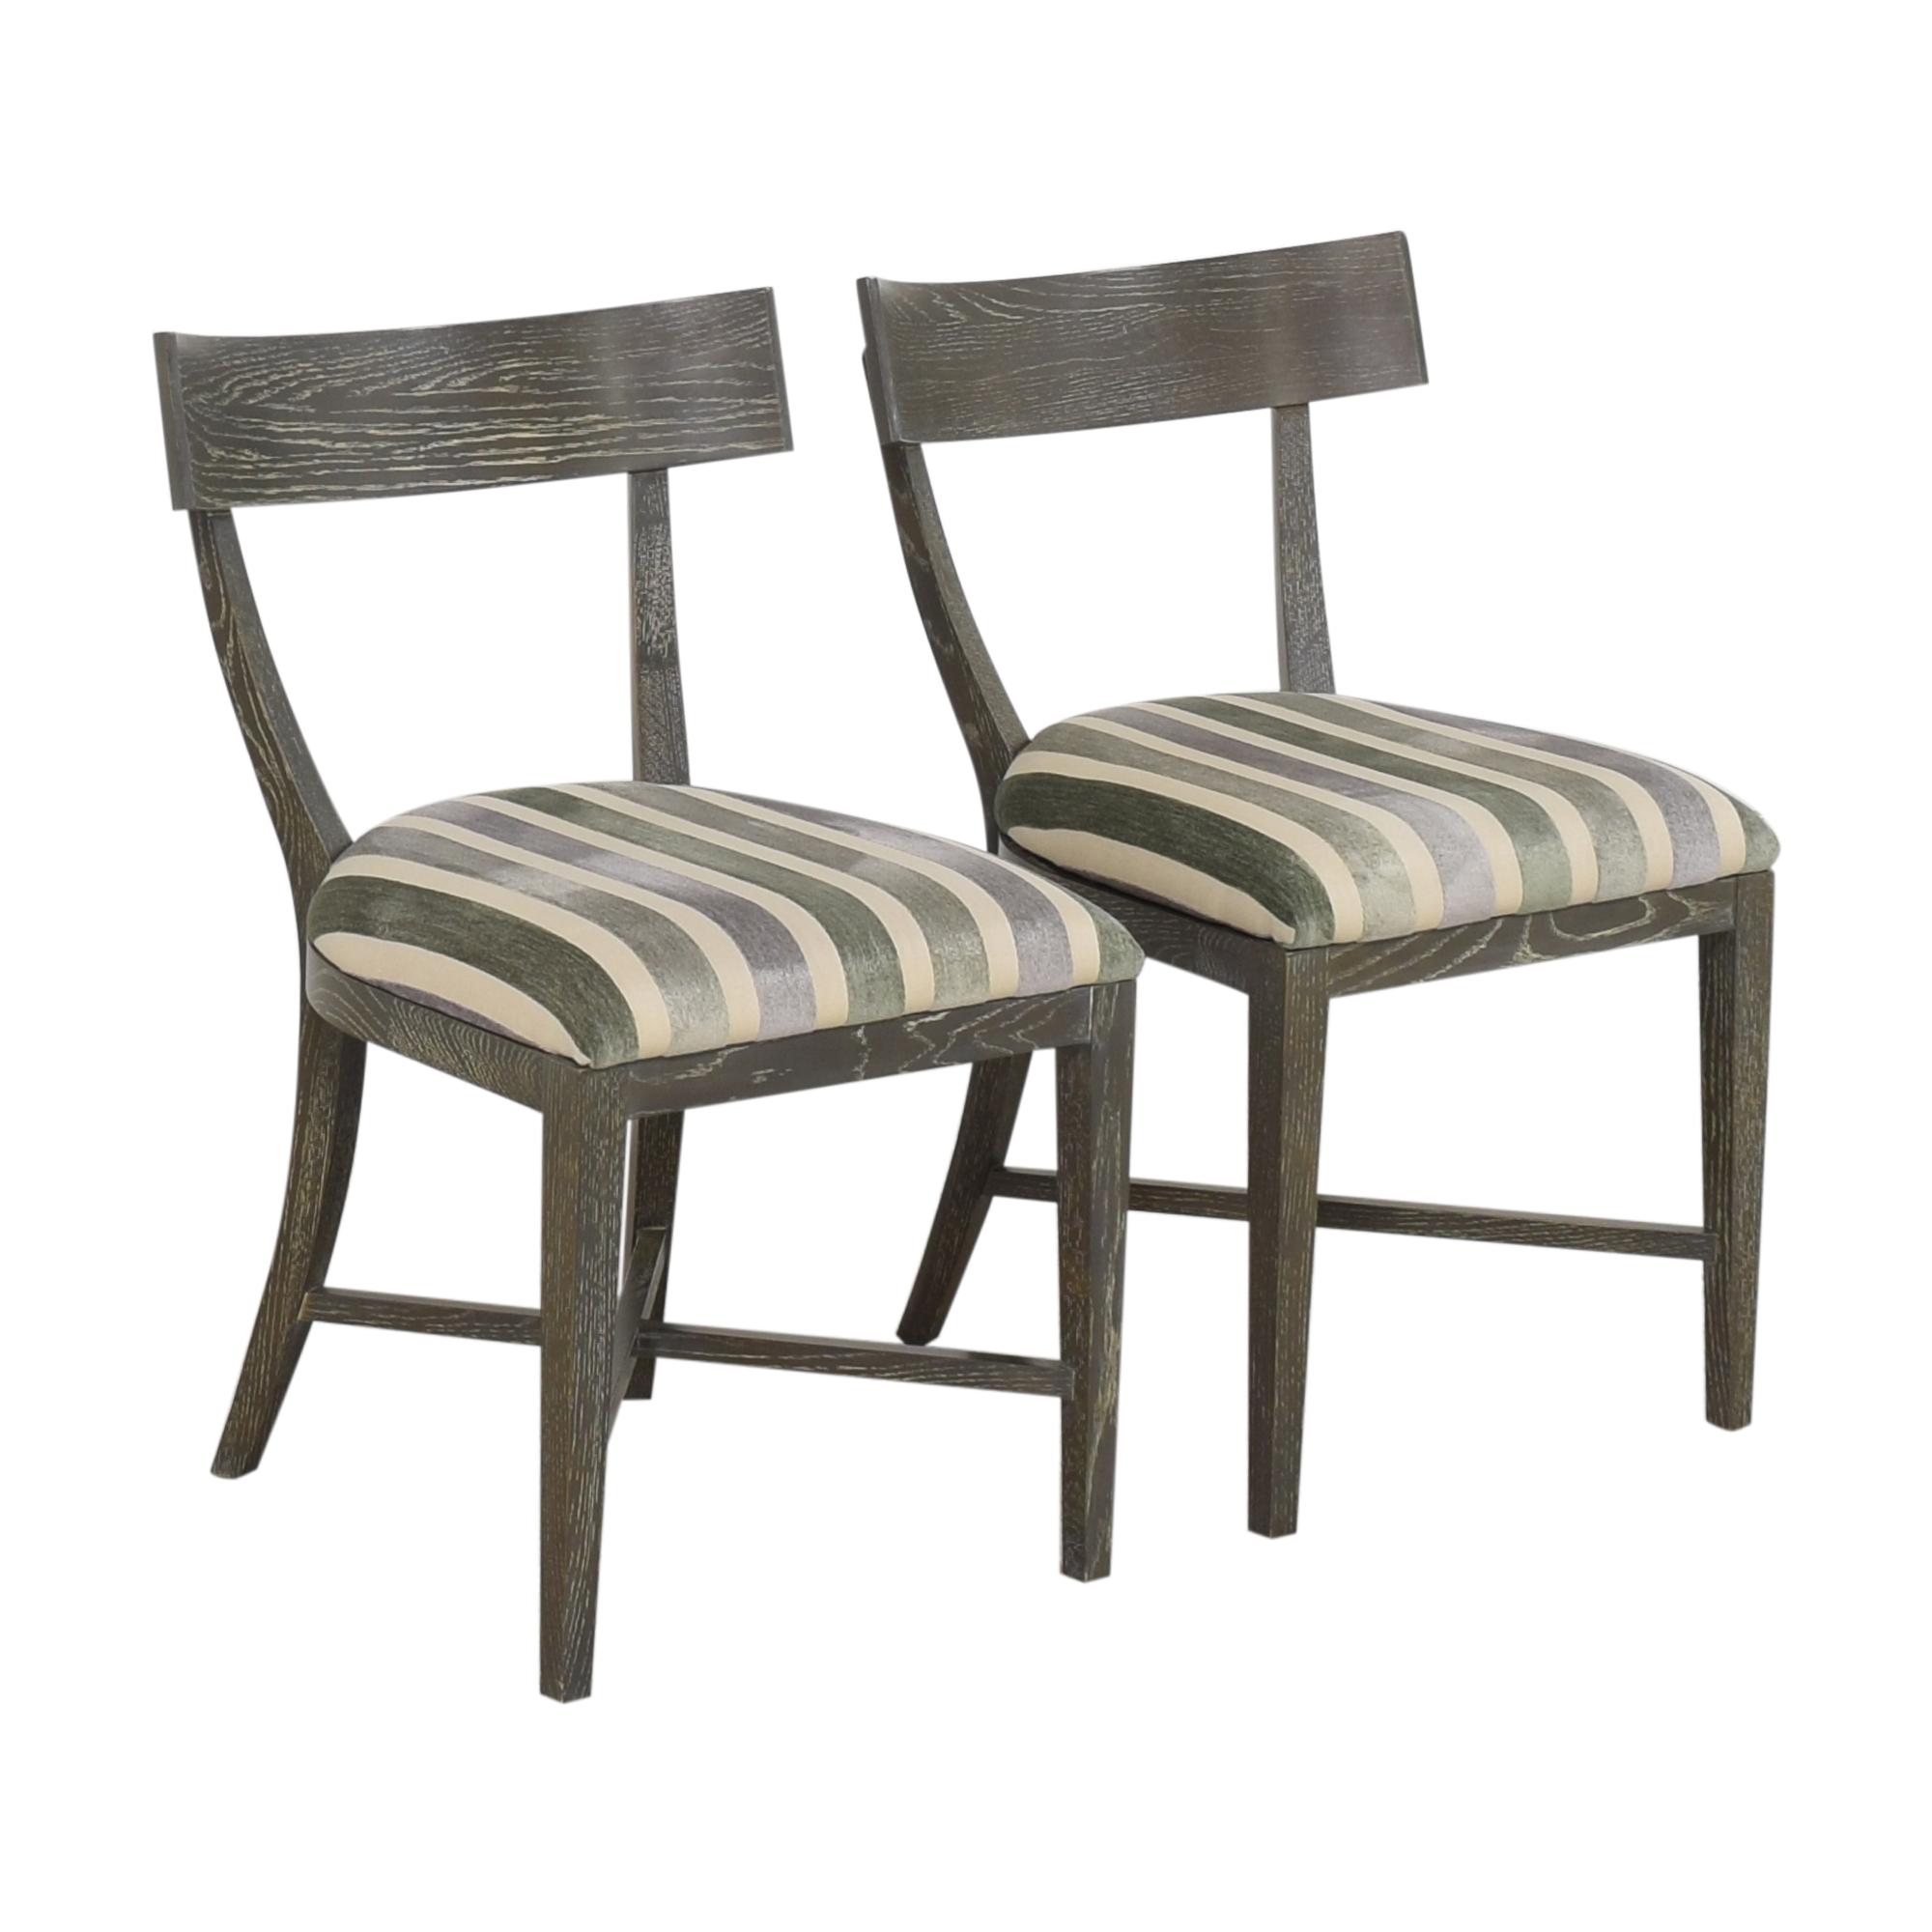 shop Arteriors Arteriors Caden Dining Chairs online